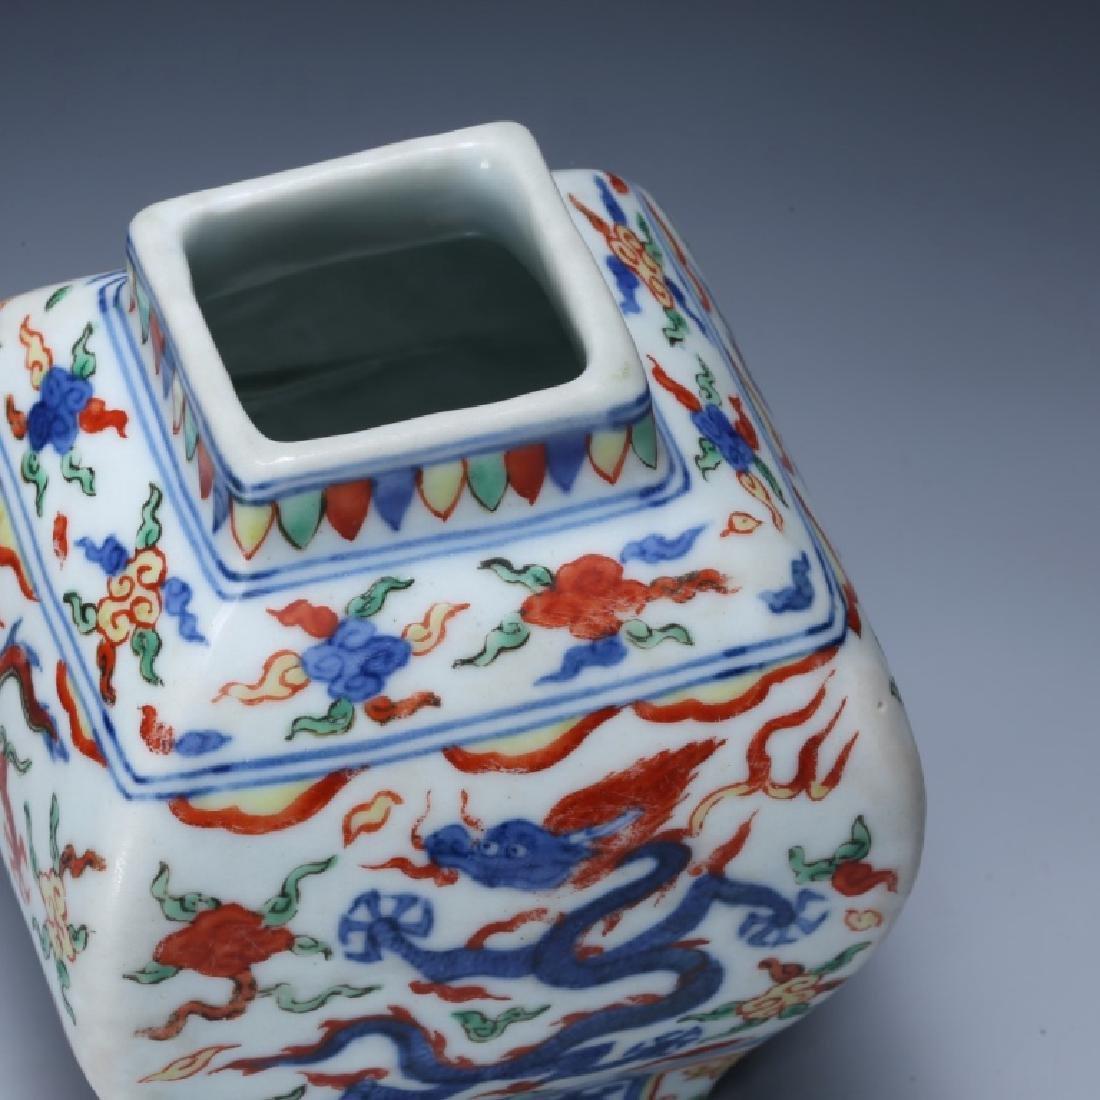 Chinese Qing Dynasty Wucai Porcelain Jar - 4